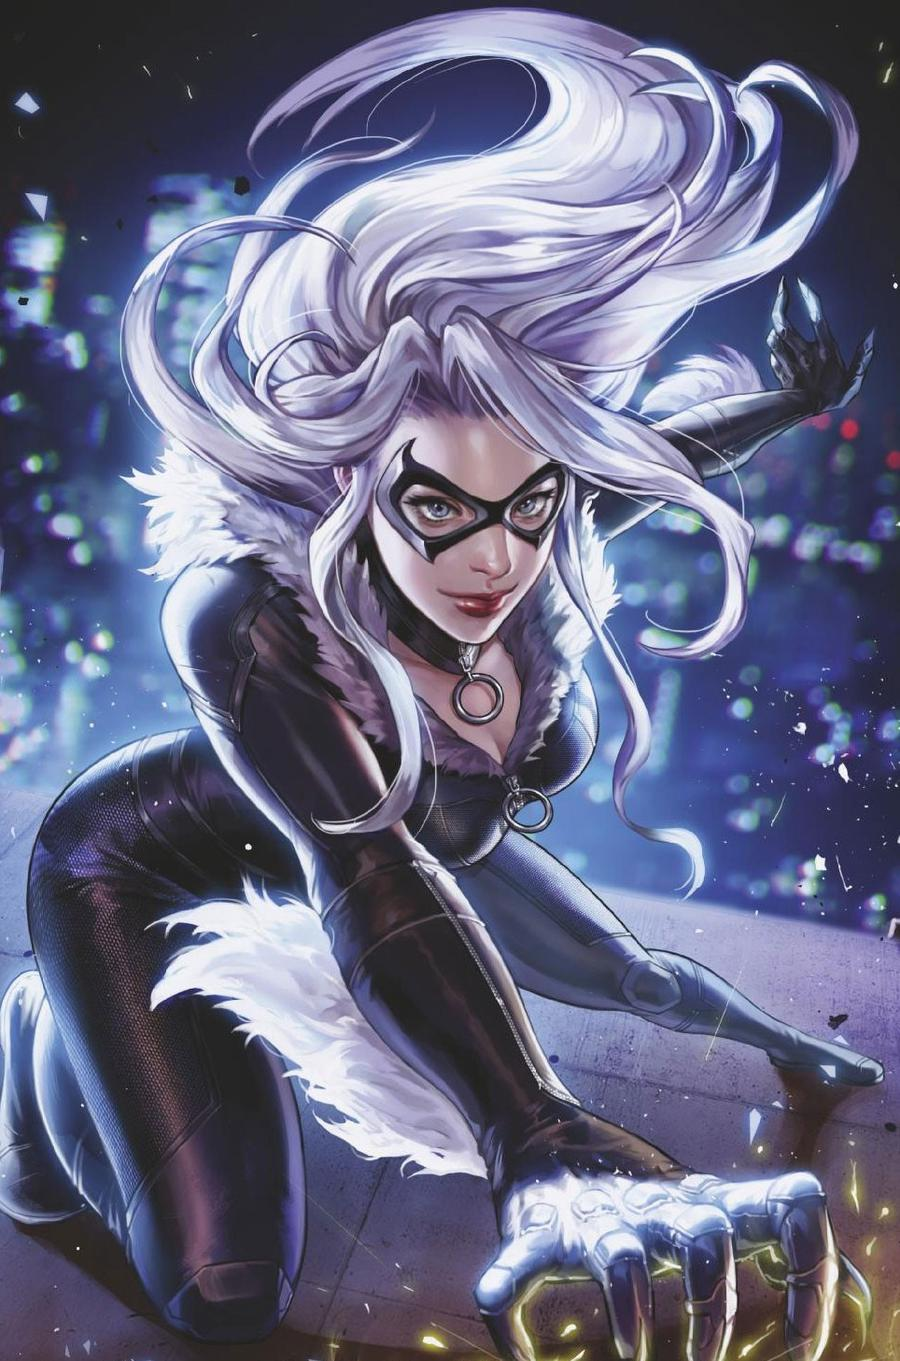 Amazing Spider-Man Vol 5 #21 Cover C Variant Sujin Jo Marvel Battle Lines Cover